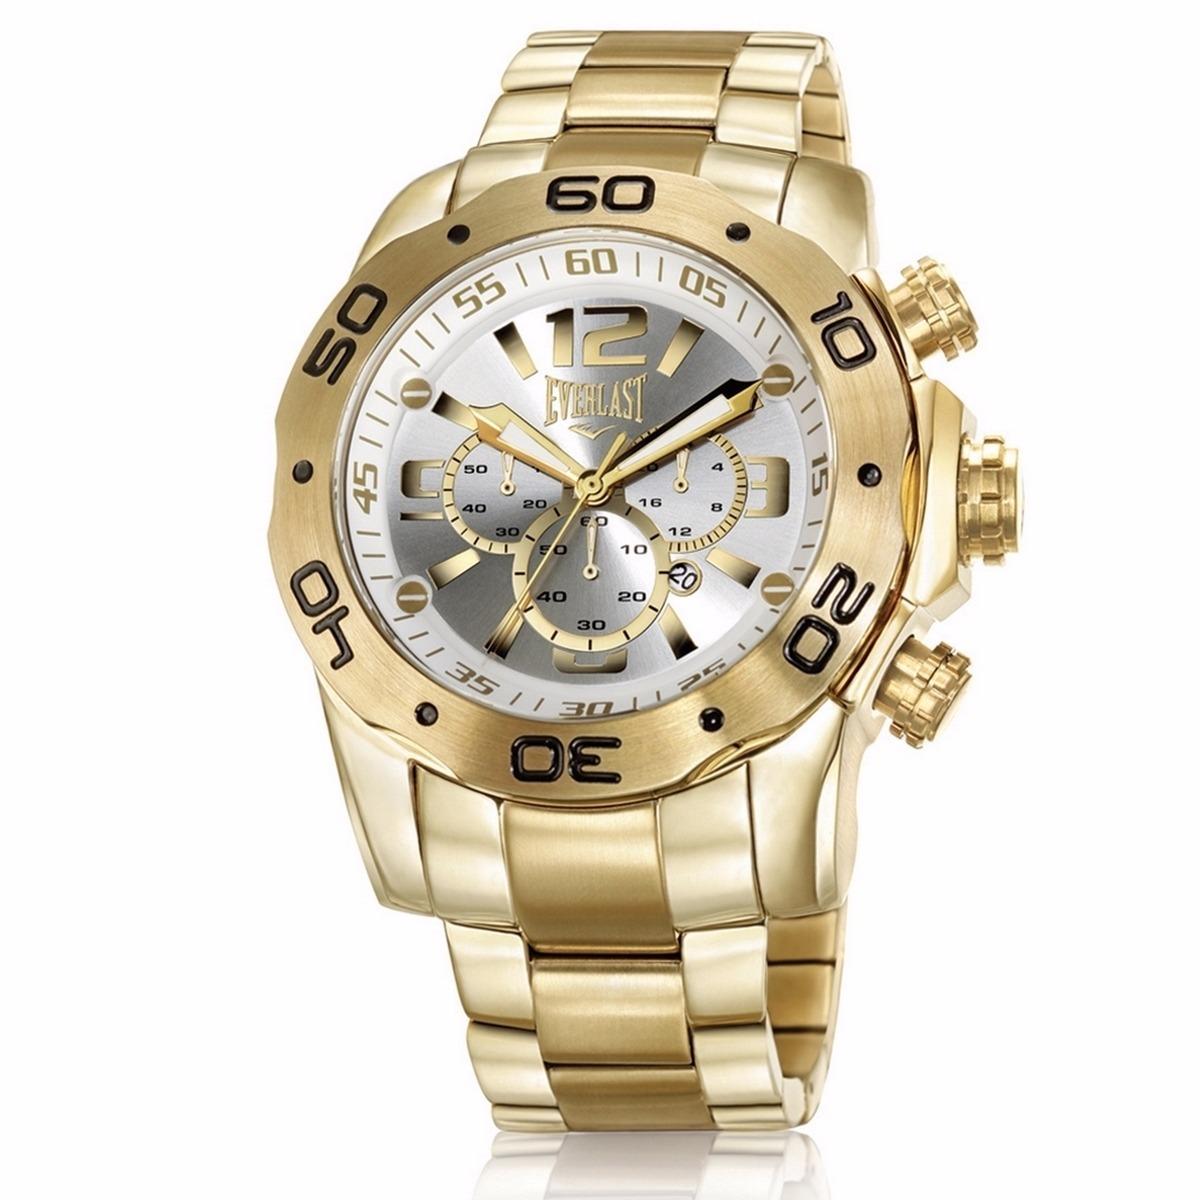 f46395f6b52 Relógio Everlast Gold Masculino Dourado Cronógrafo - E543 - R  1.399 ...